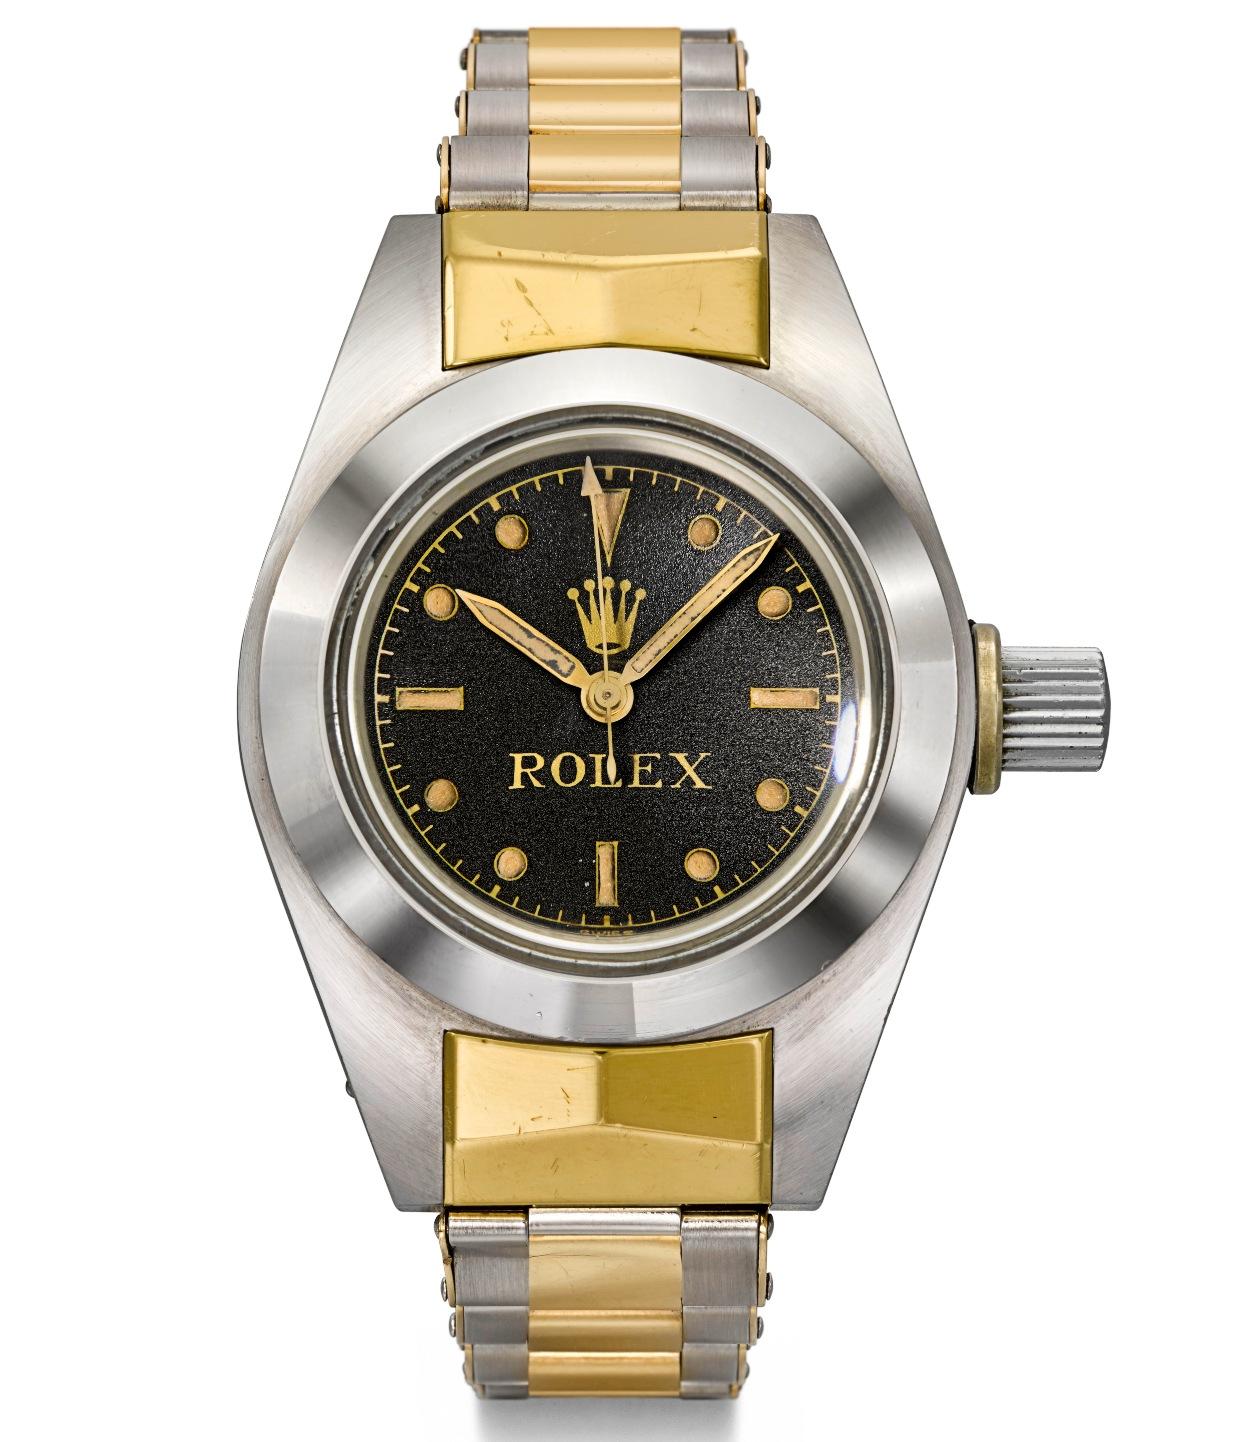 Christies Rolex Deep Sea GWA 8 nov 21 1